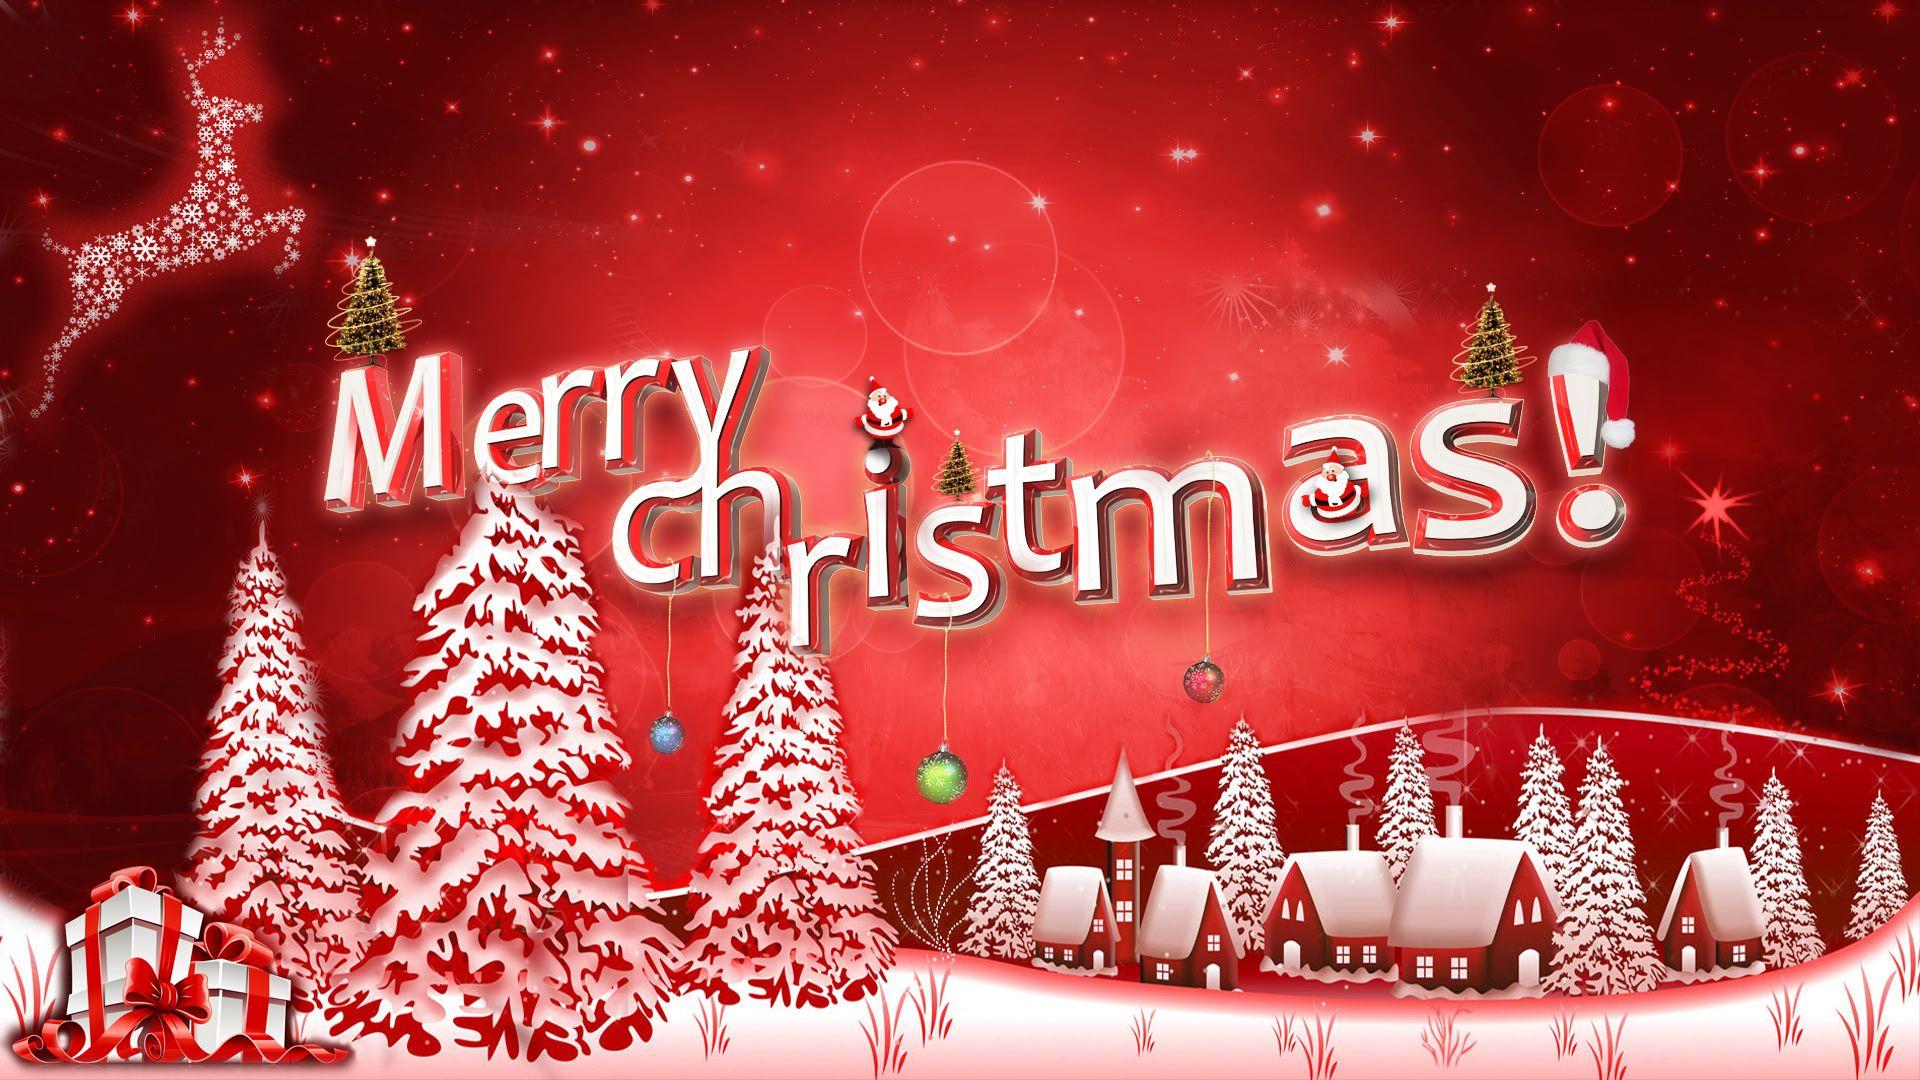 Facebook Christmas Greetings Happy Merry Christmas Facebook